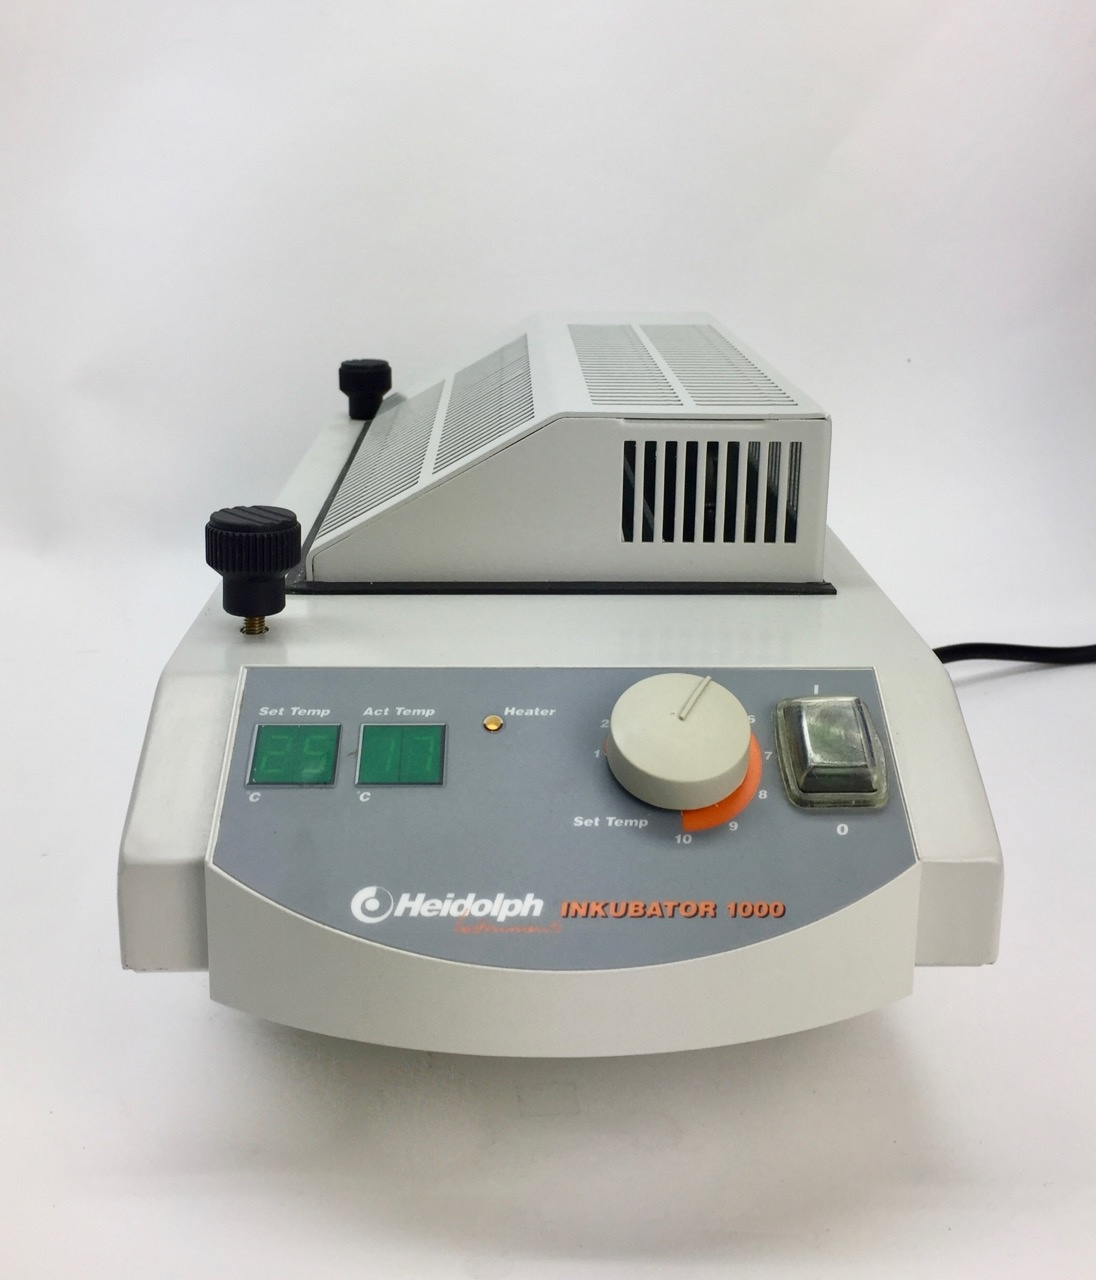 Heidolph Heidolph Heating Module Incubator 1000